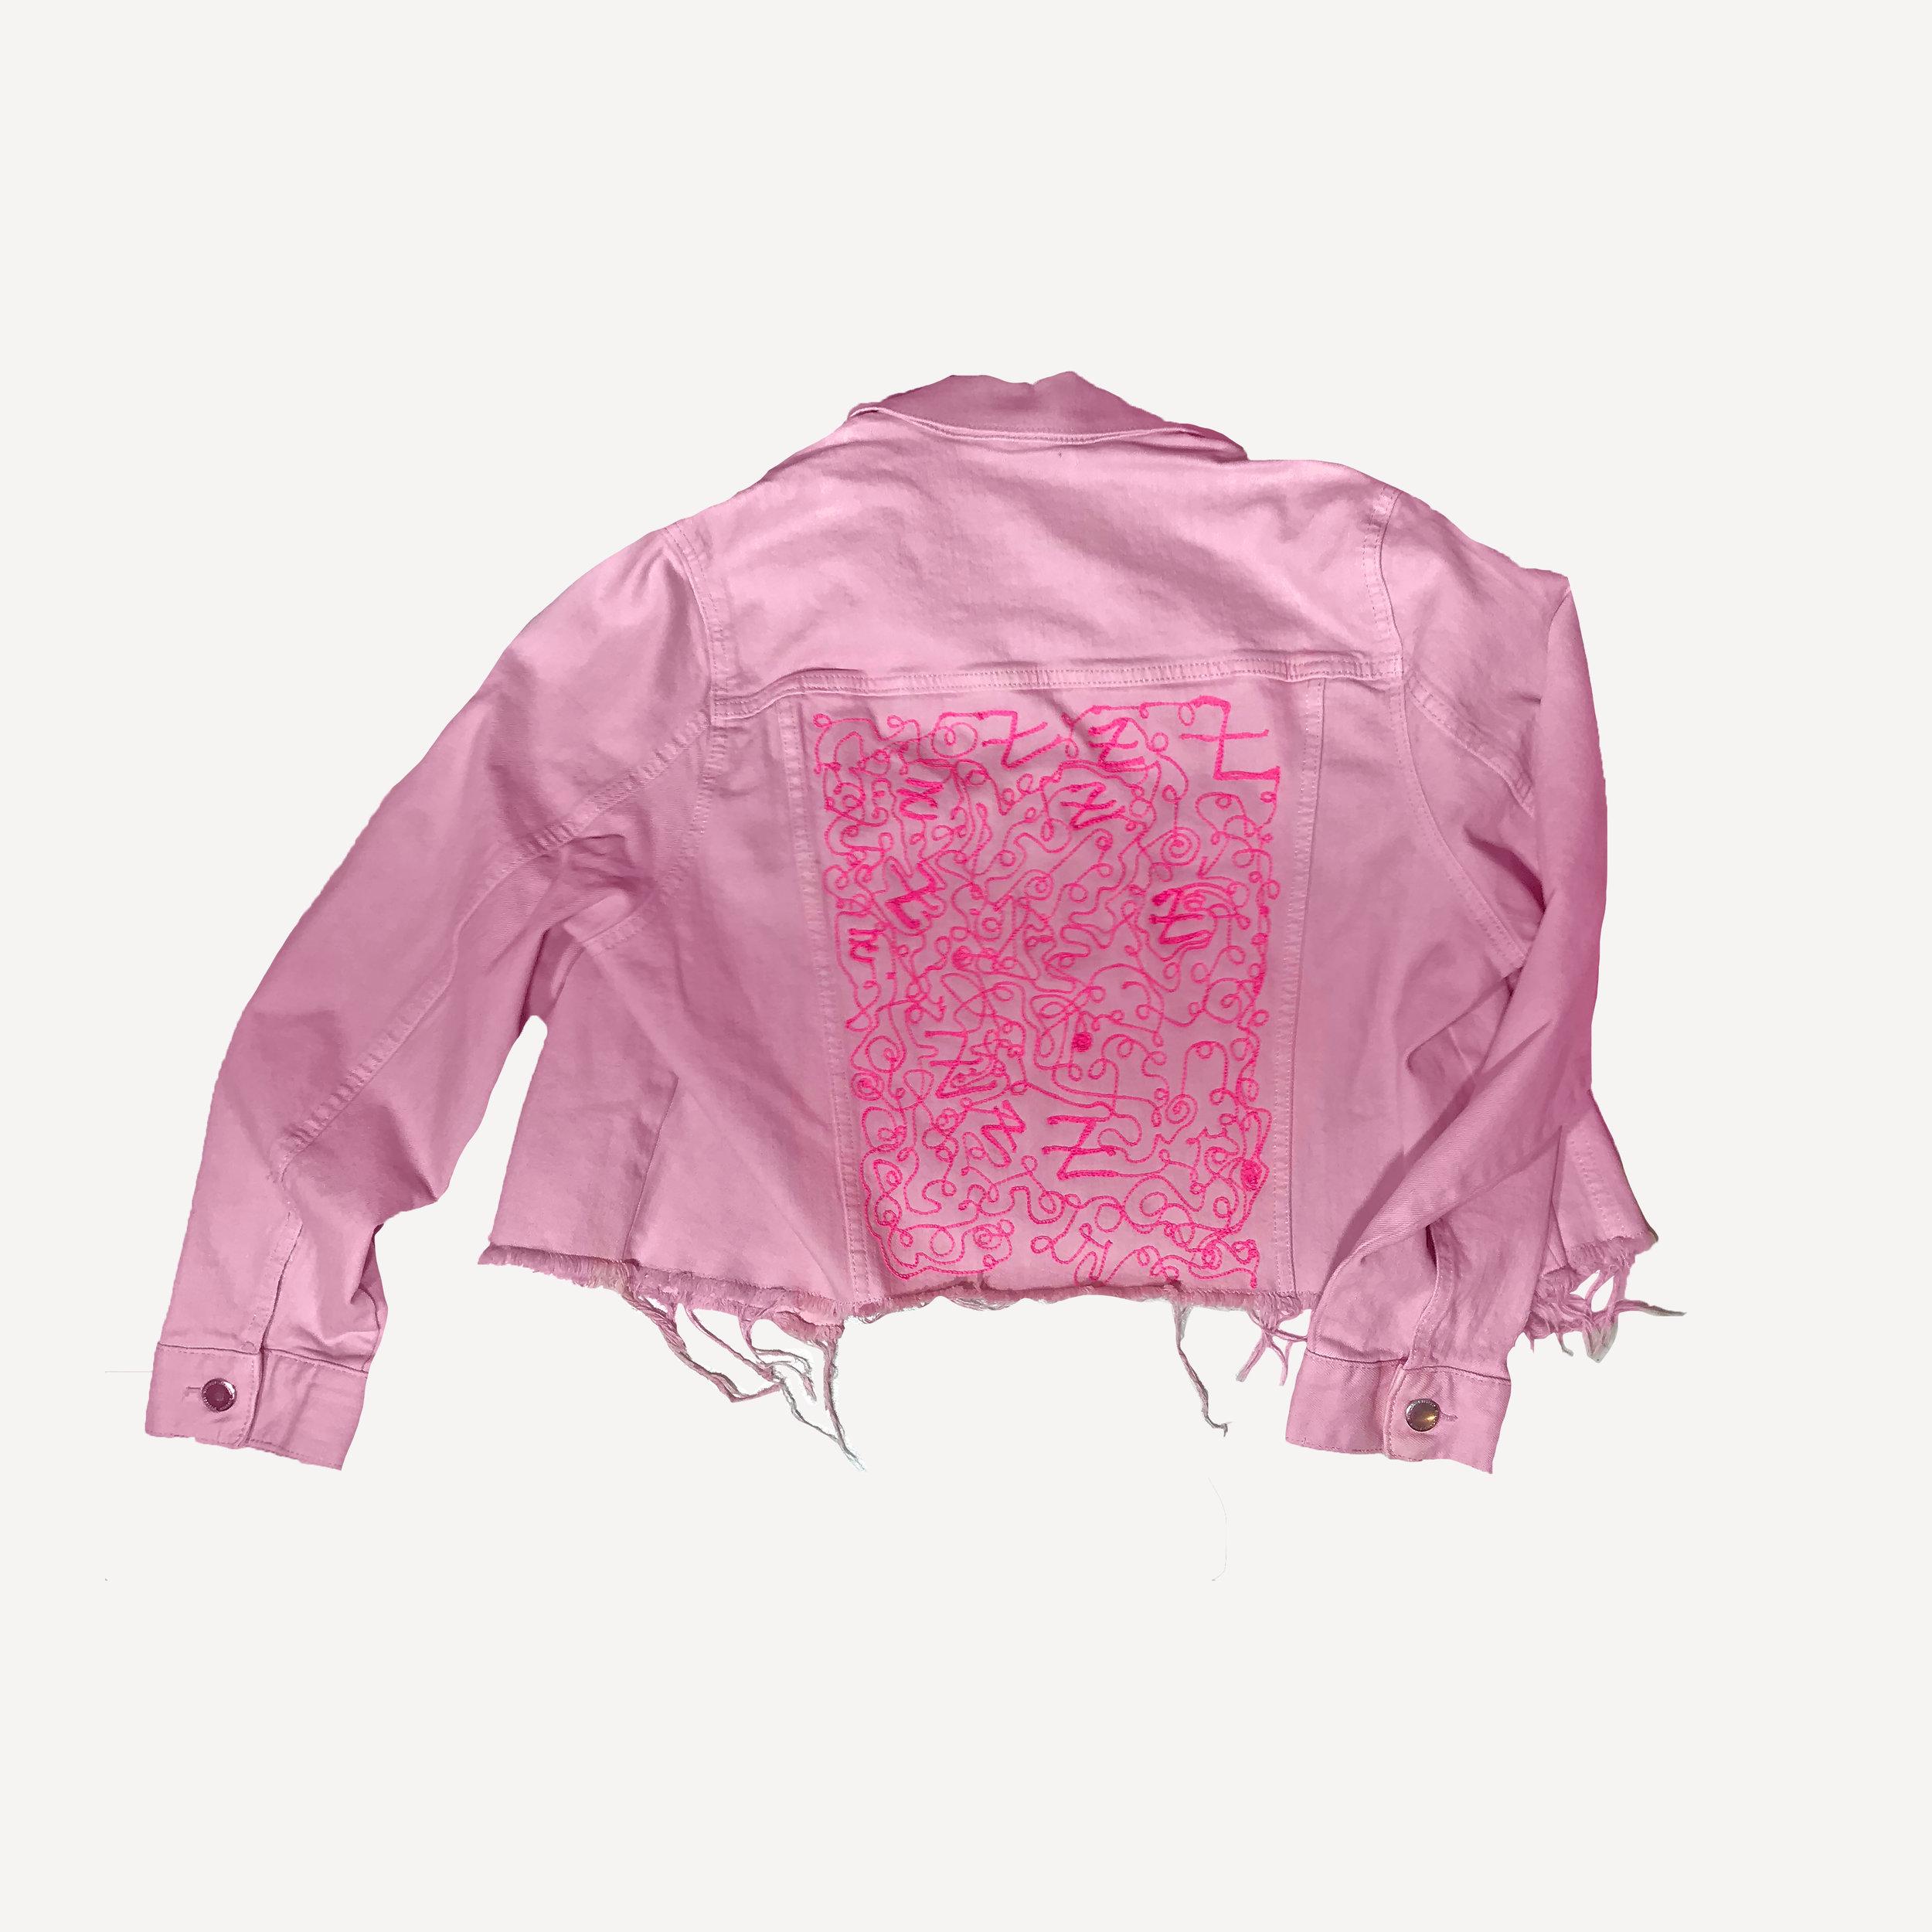 Pink Z Jacket Square Back copy 100.jpg